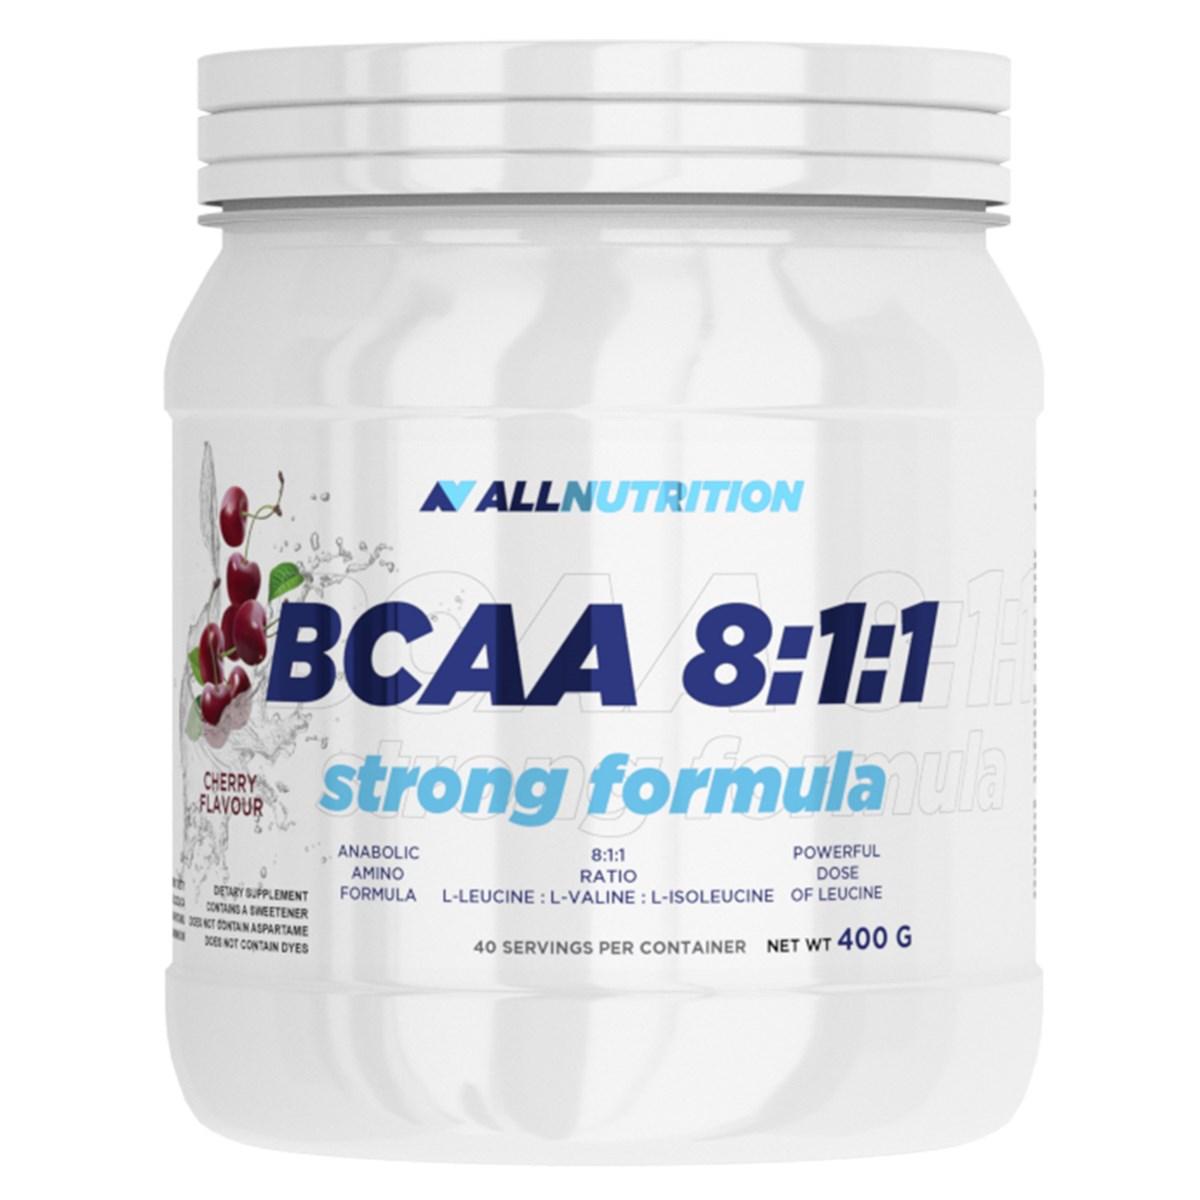 BCAA 8:1:1 Strong Formula - 400 grams